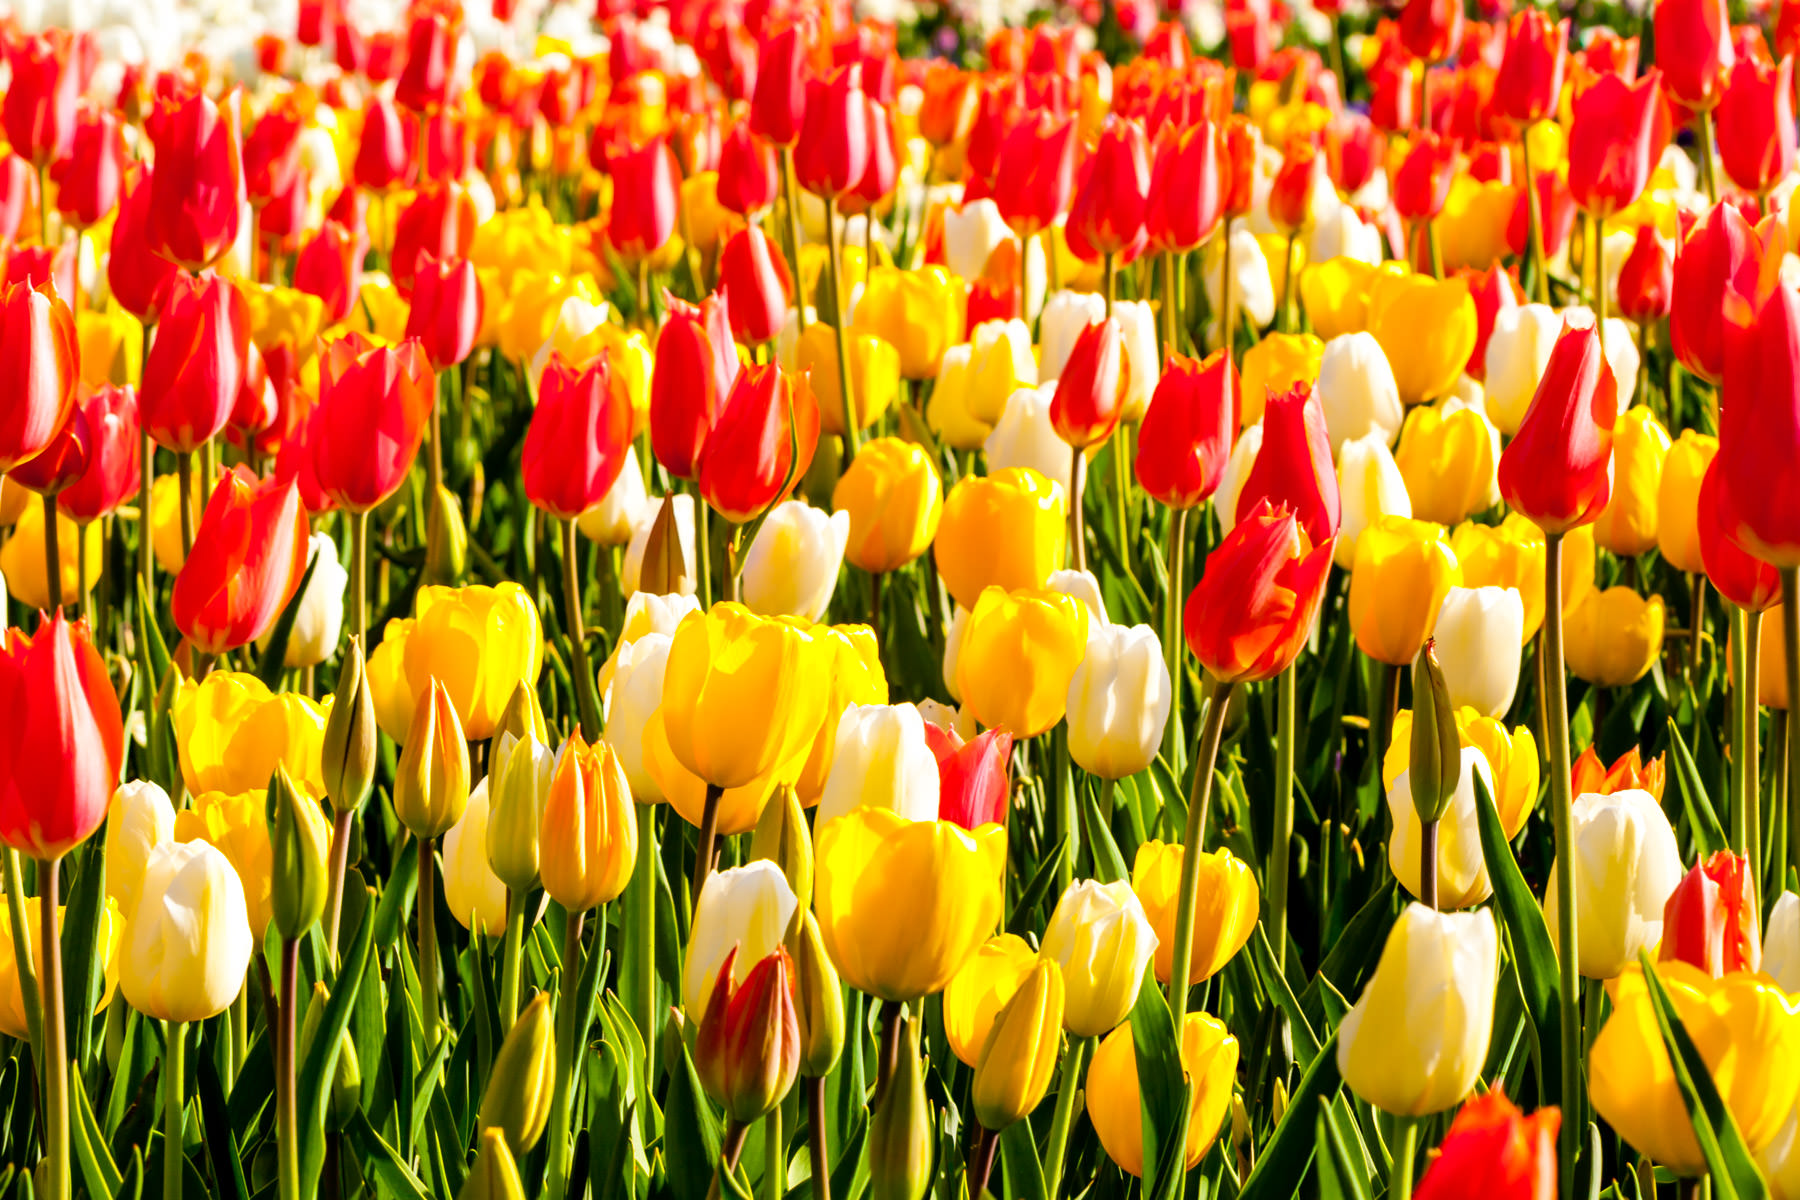 A field of tulips at the Dallas Arboretum.